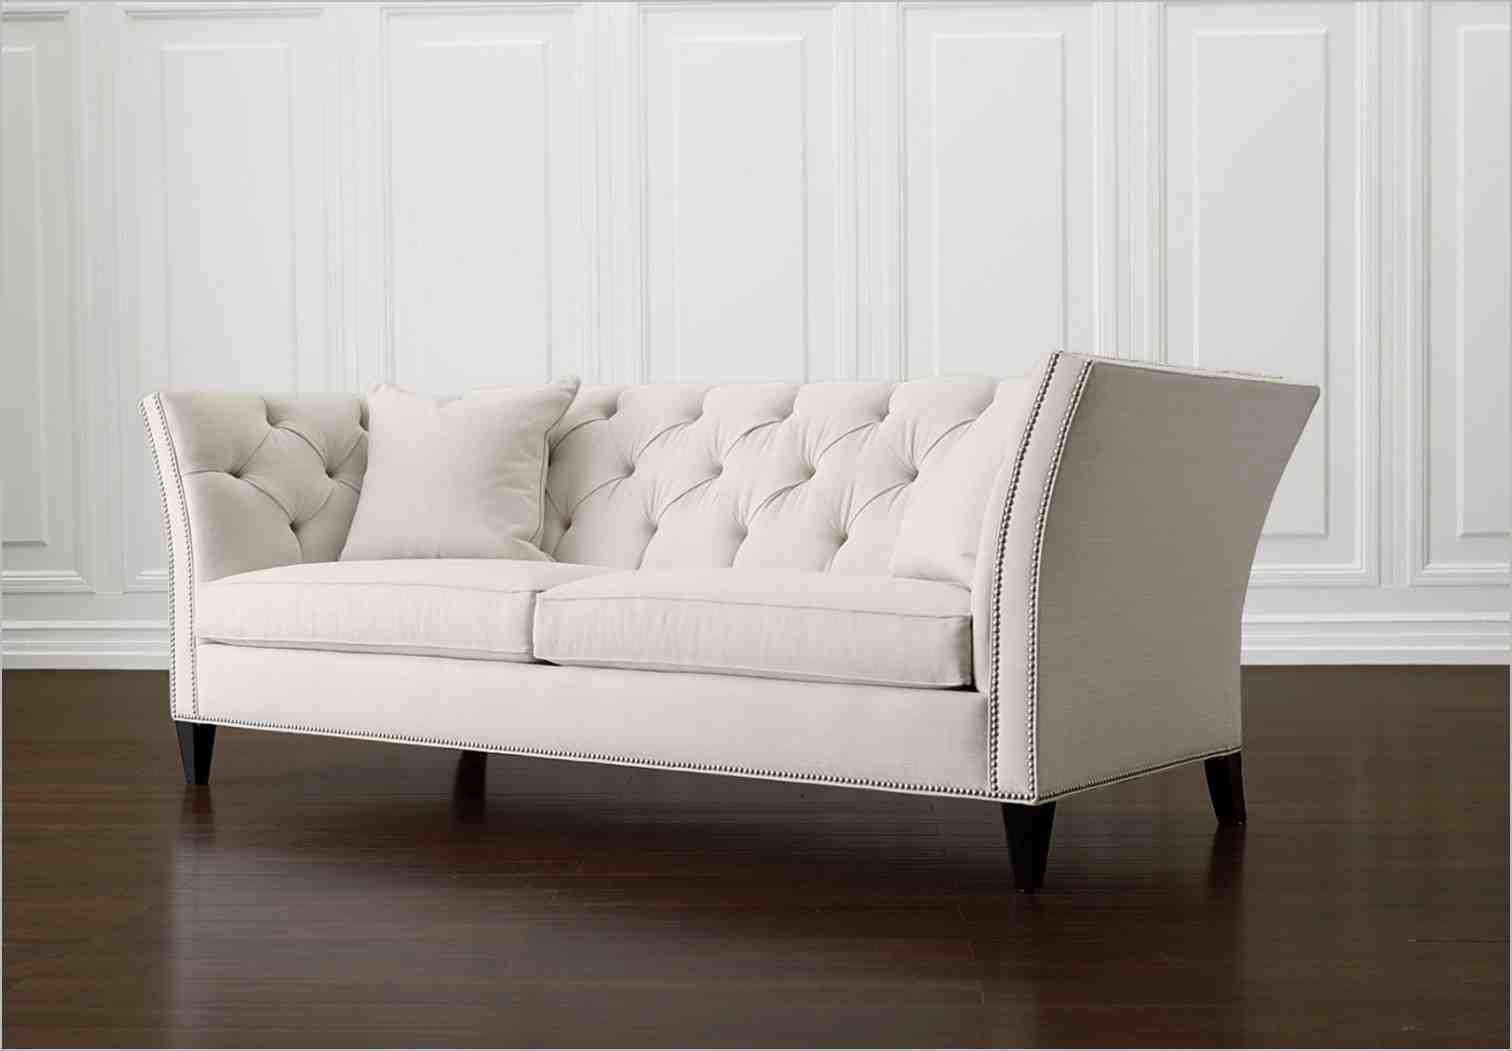 Ethan Allen Furniture Sofas Home Furniture Design